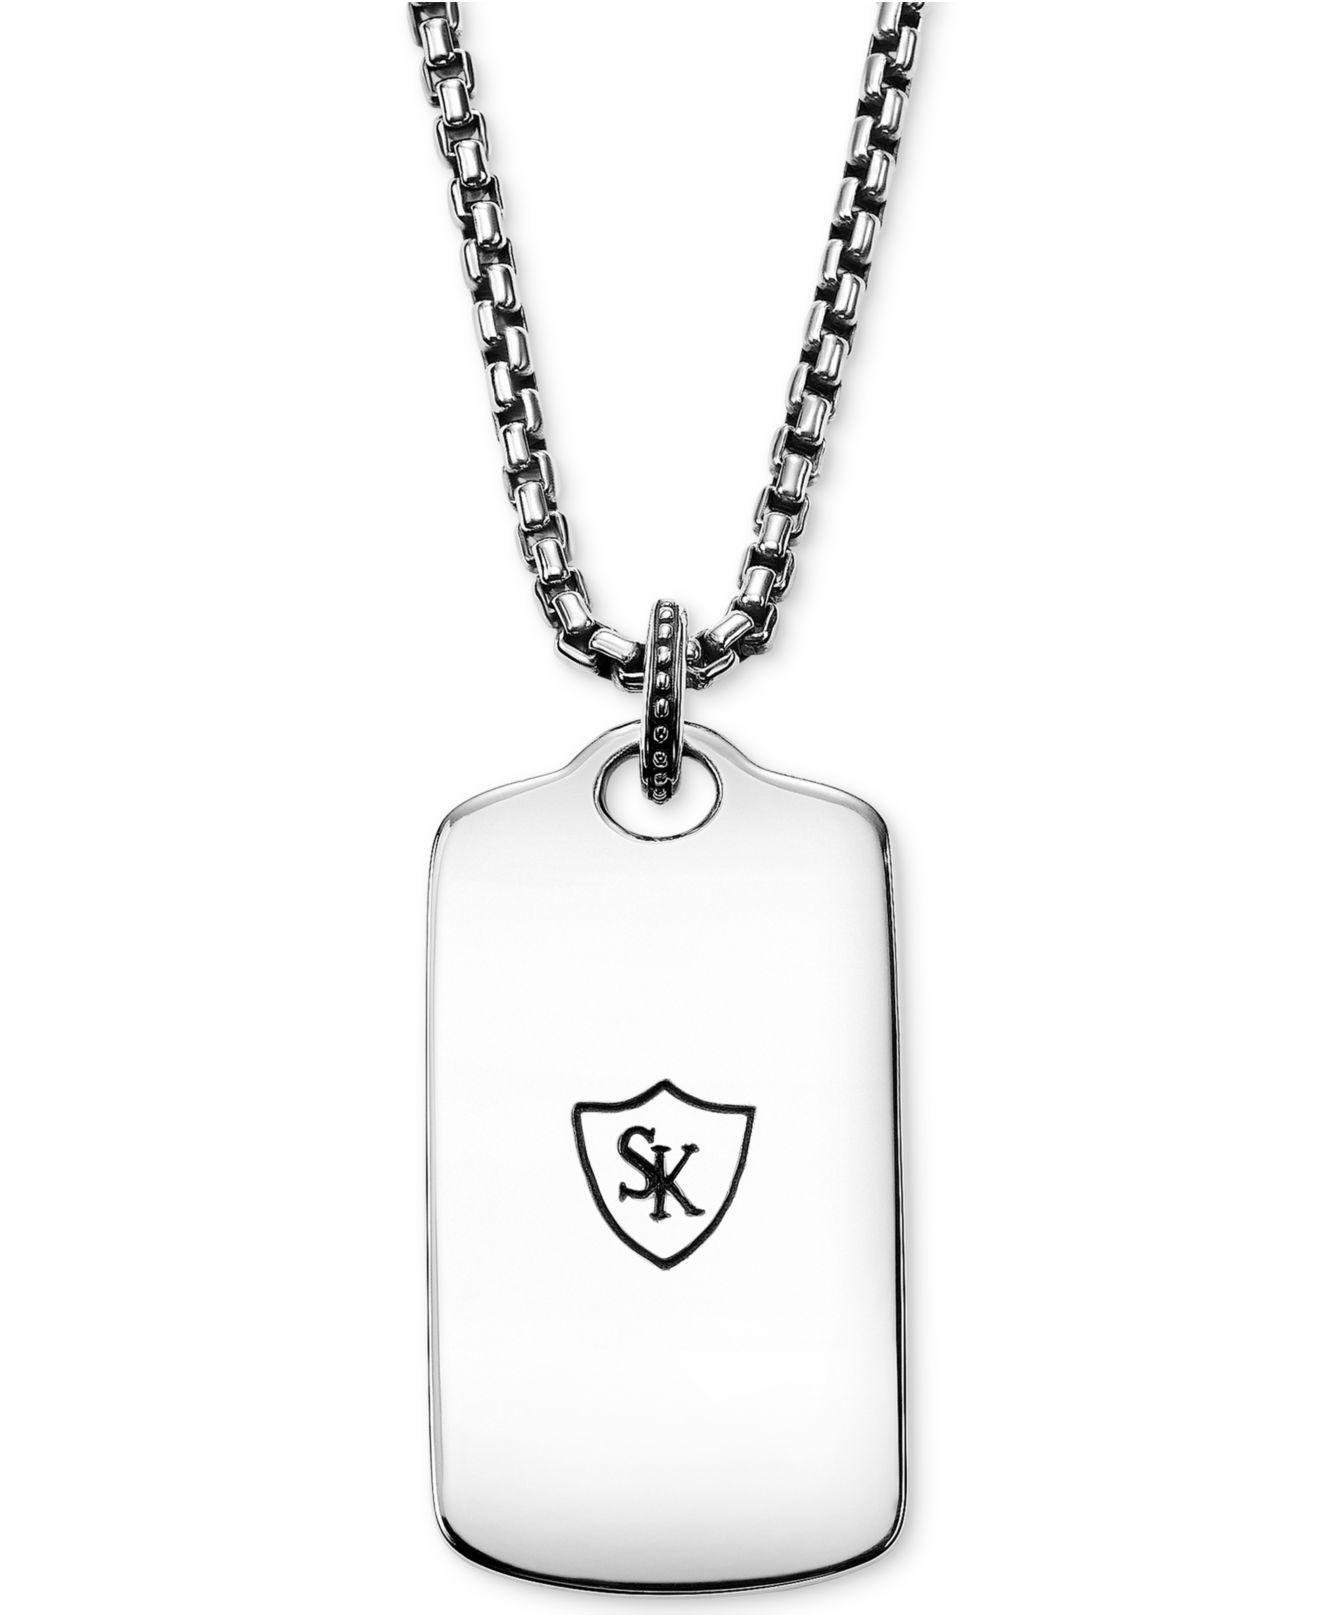 Lyst scott kay mens textured dog tag pendant necklace in sterling lyst scott kay mens textured dog tag pendant necklace in sterling silver in metallic for men aloadofball Gallery